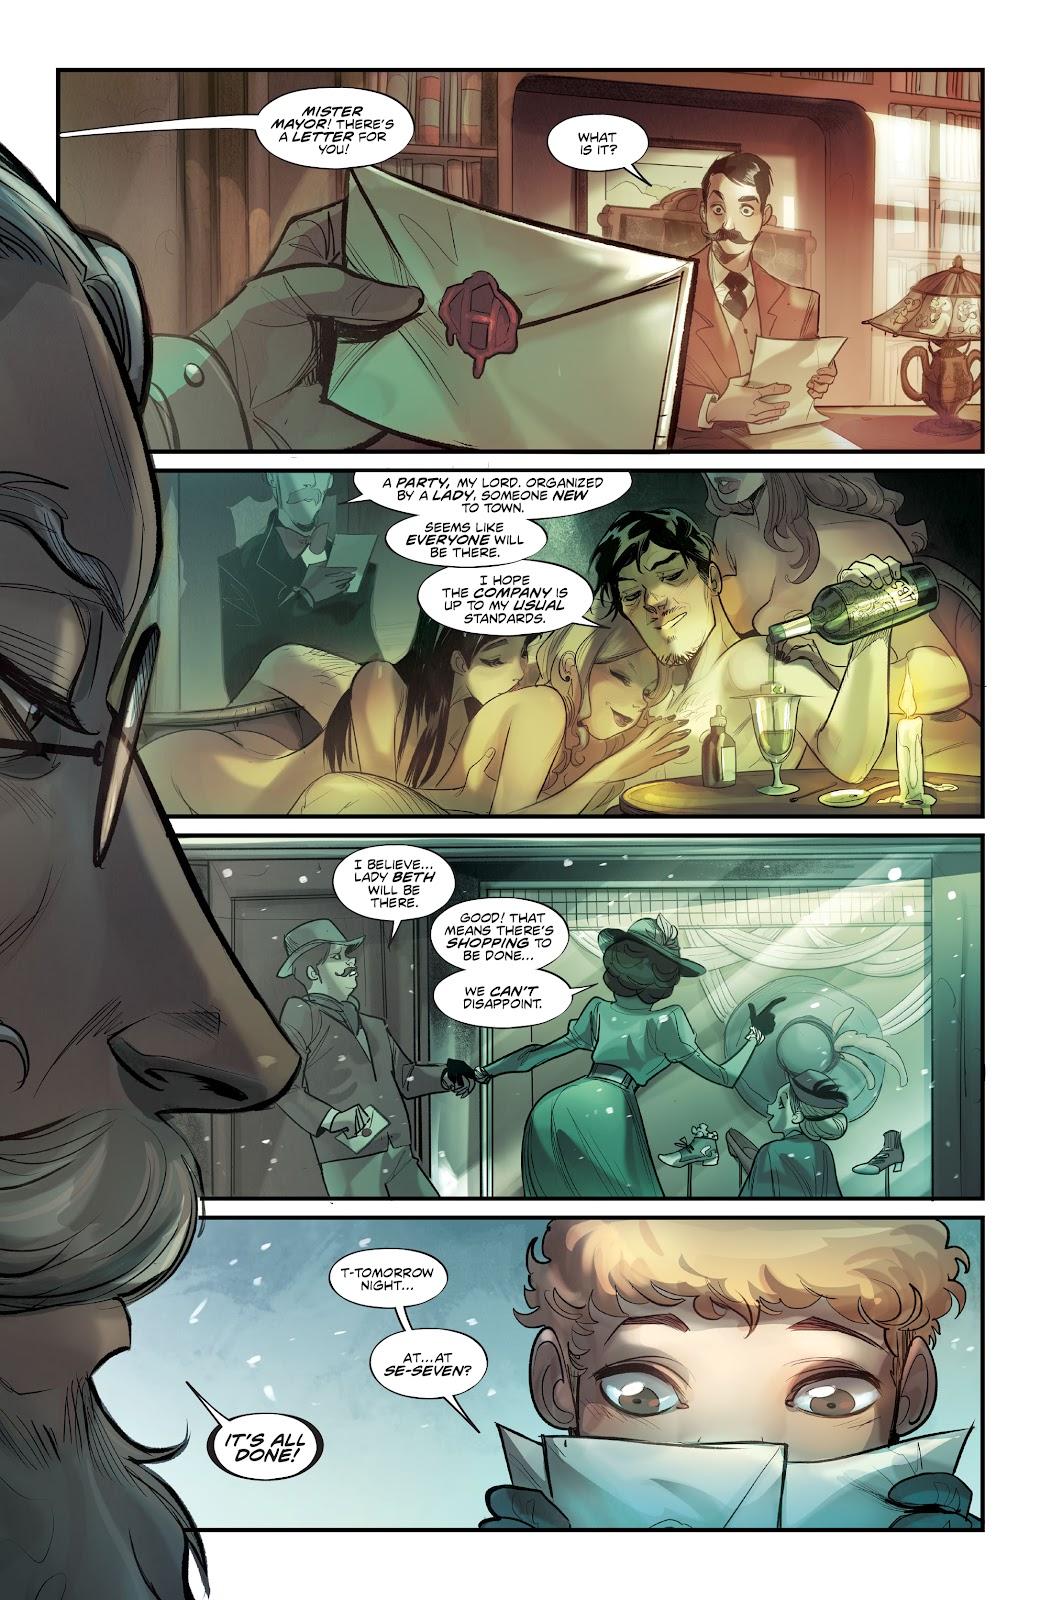 Read online Mirka Andolfo's Mercy comic -  Issue #2 - 9